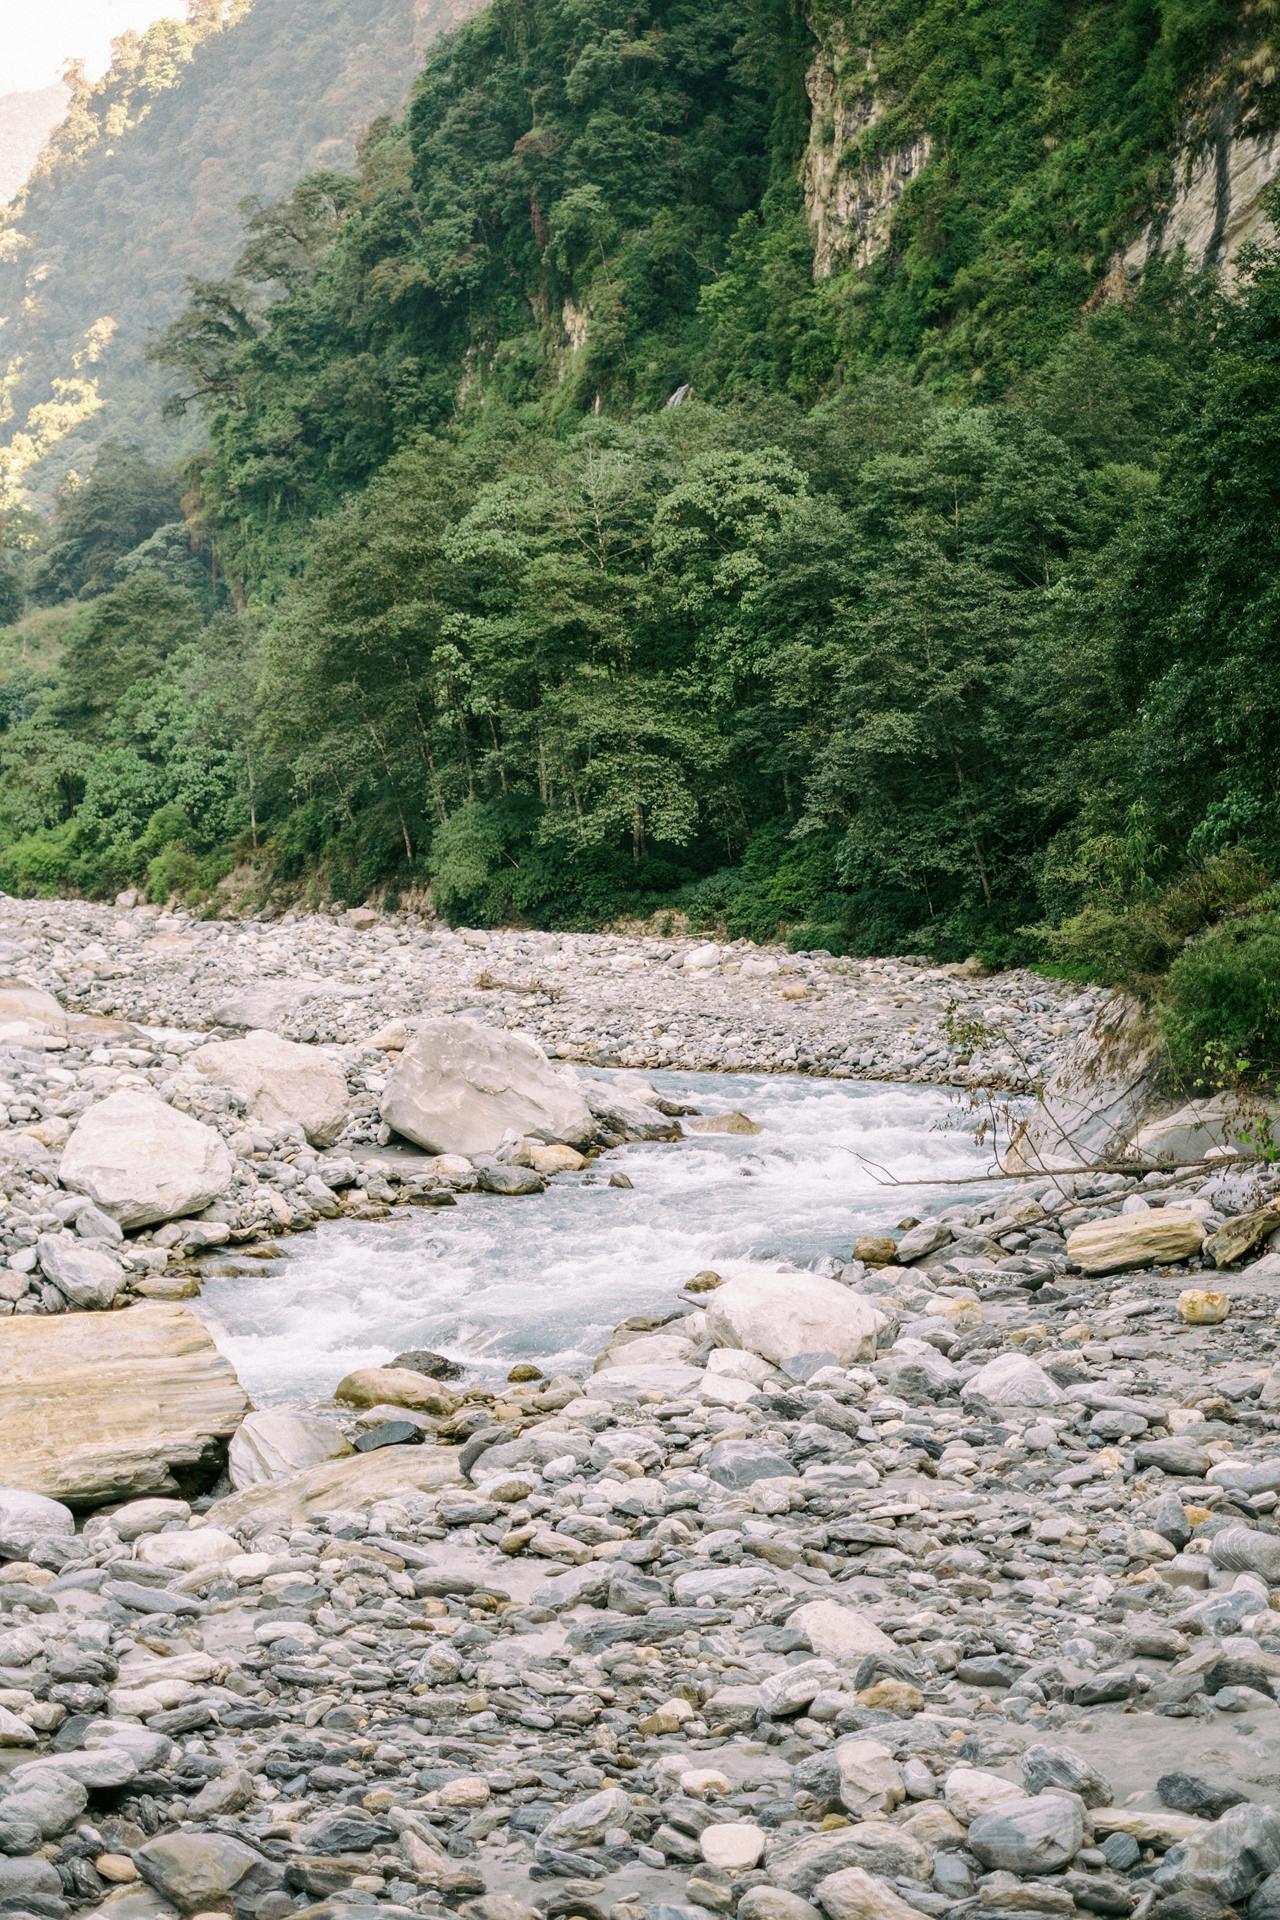 Nepal 2019 - Trekking Annapurna Base Camp 80